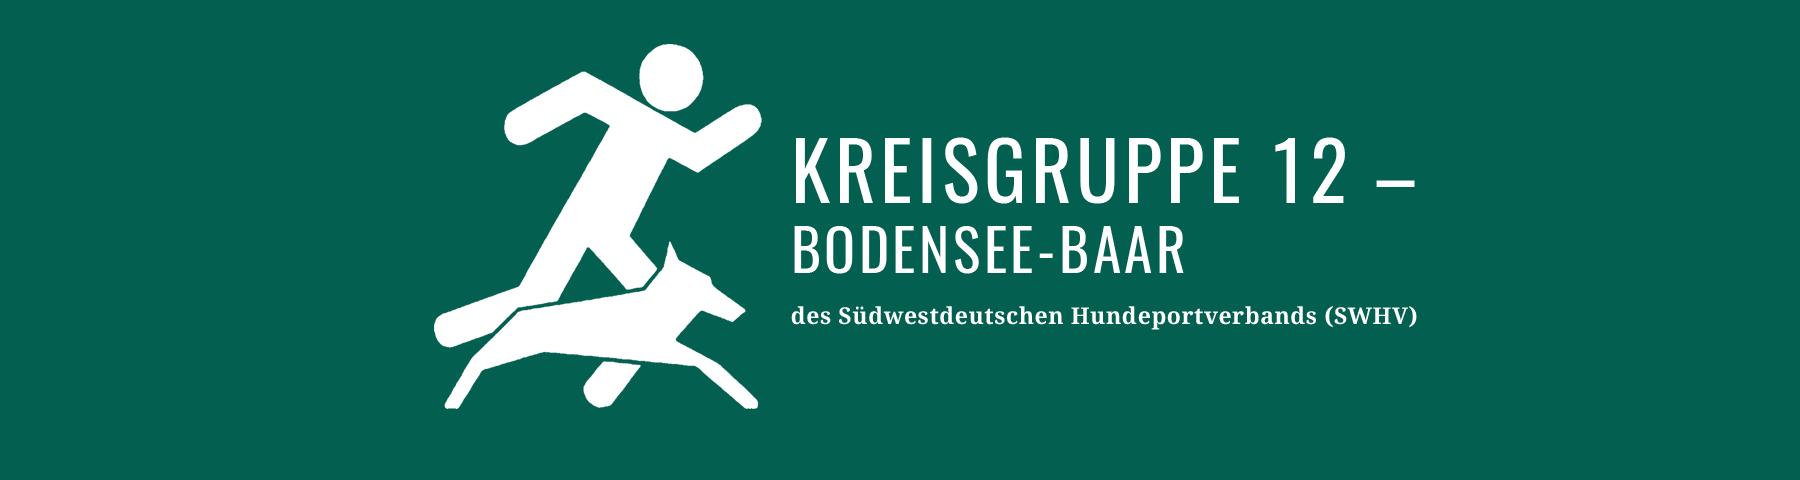 Südwestdeutscher Hundsportverband // KG12 – Bodensee-Baar